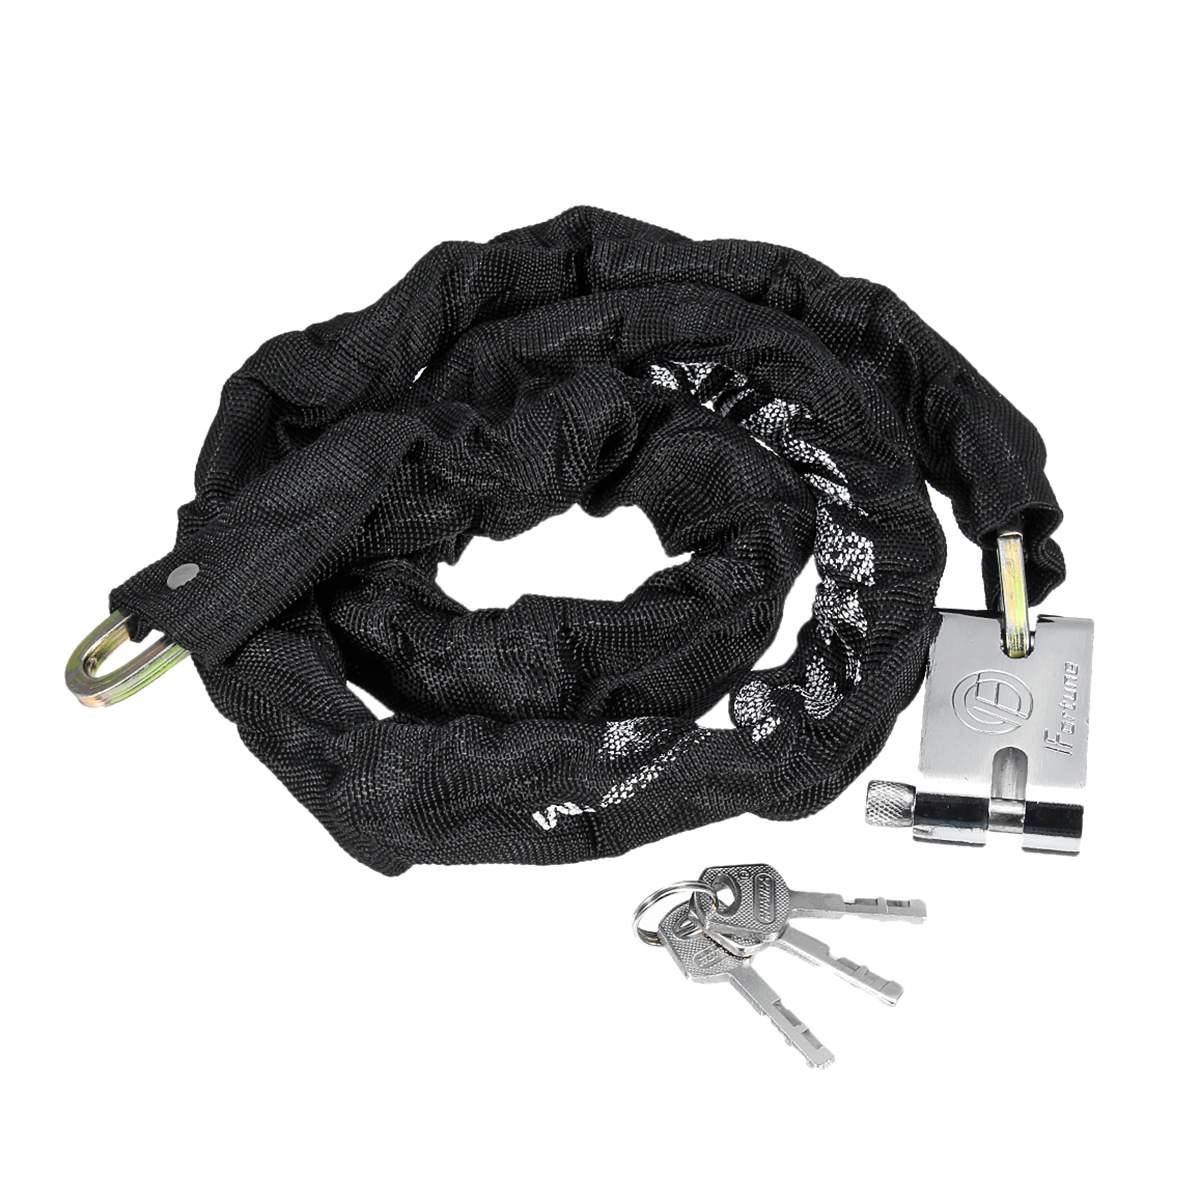 65cm/1.8m Motorcycle Chain Lock…